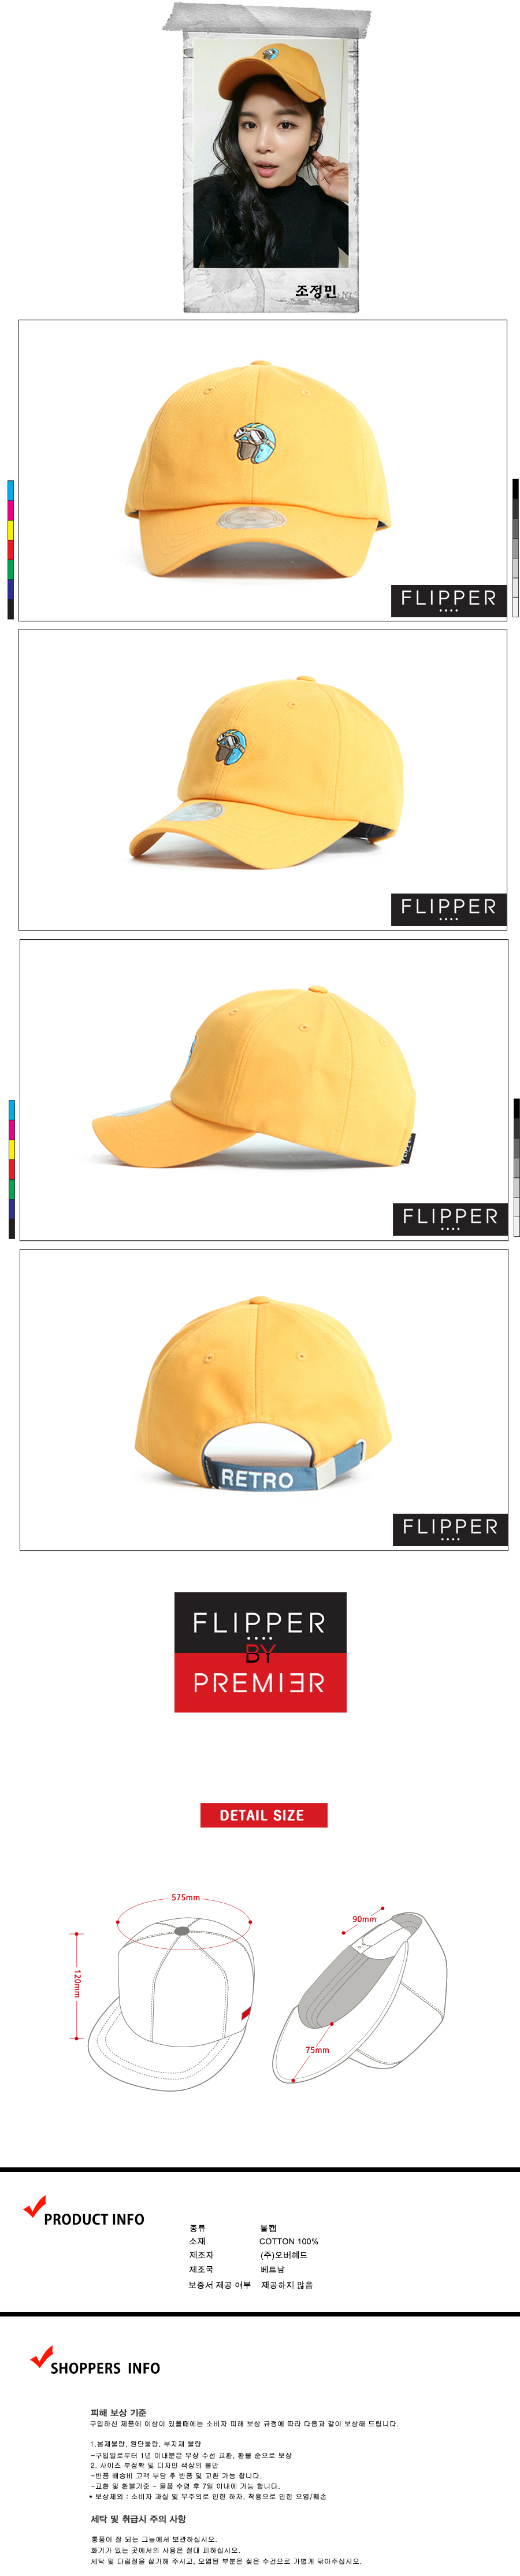 [ PREMIER ] [Premier] Flipper Ball Cap Helmet Icon Mustard (FL054)